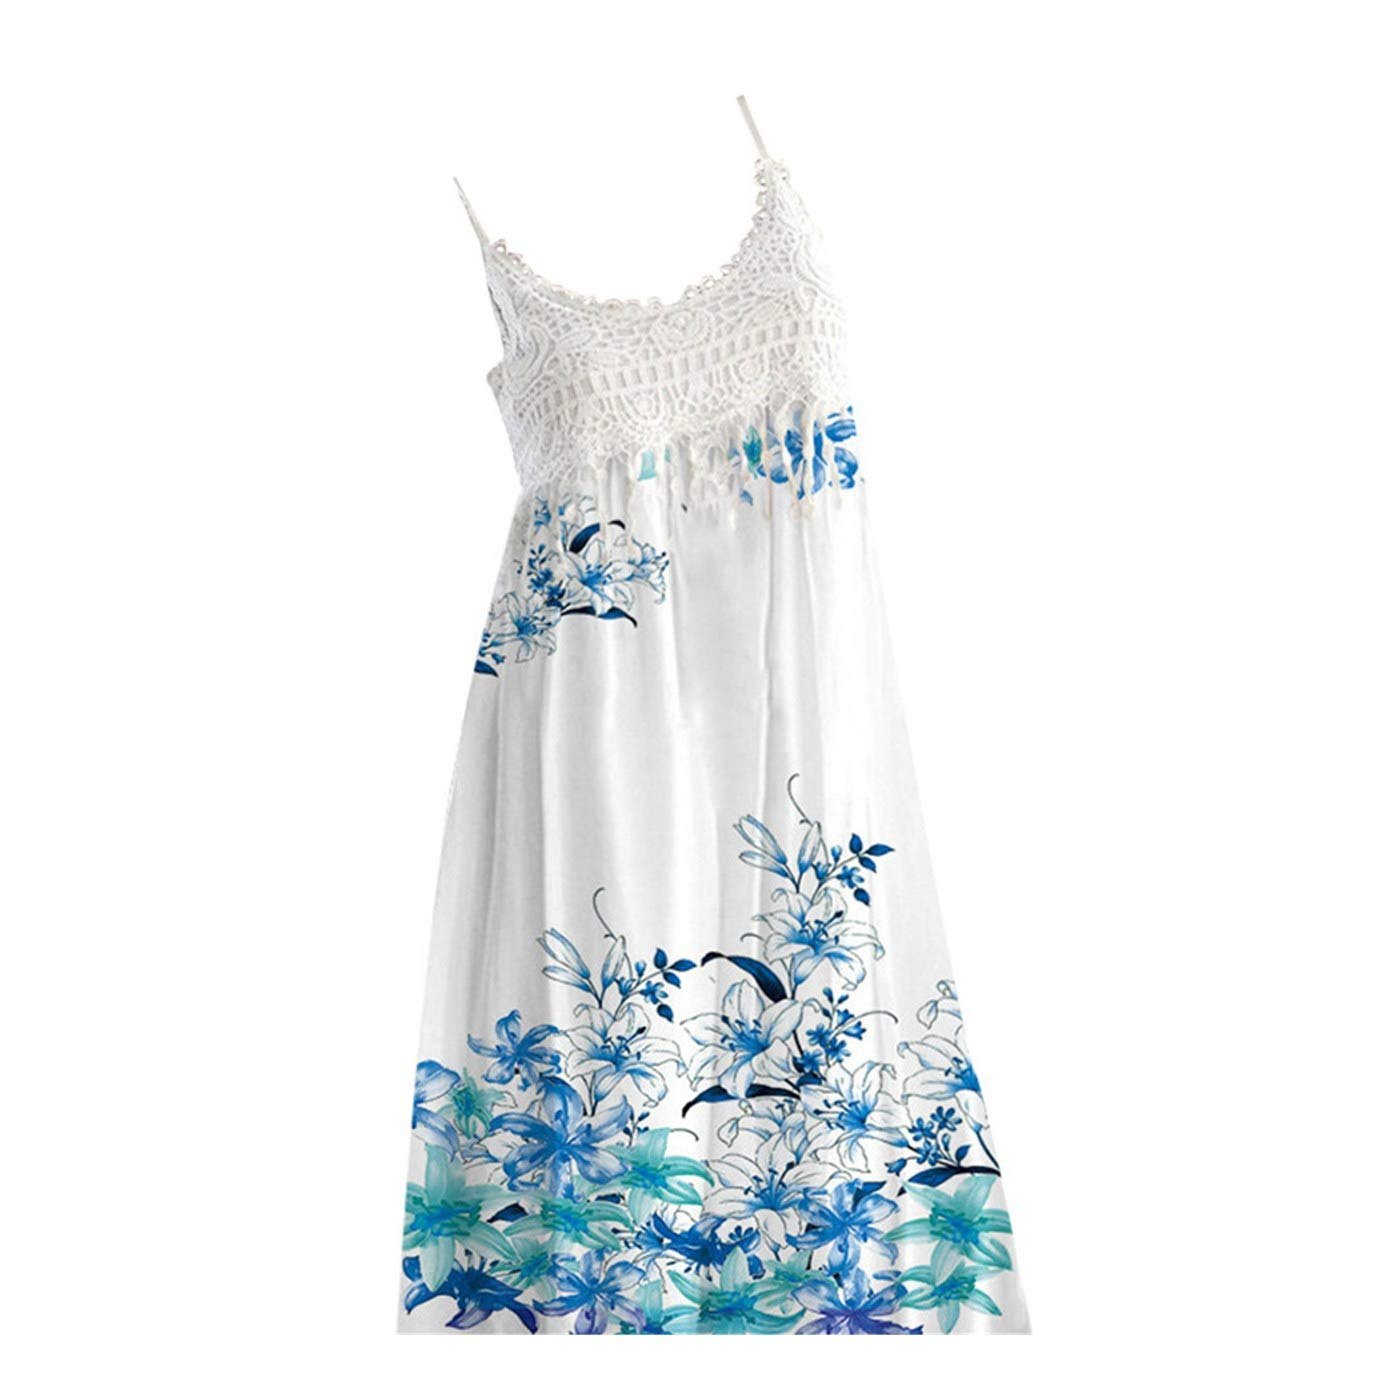 KUDICO Damen Kleid Ärmellos Sling Sommerkleider Lässig Locker Minikleid Spitze Blumendruck Gekräuselt T-Shirt Kleid Strandkleid